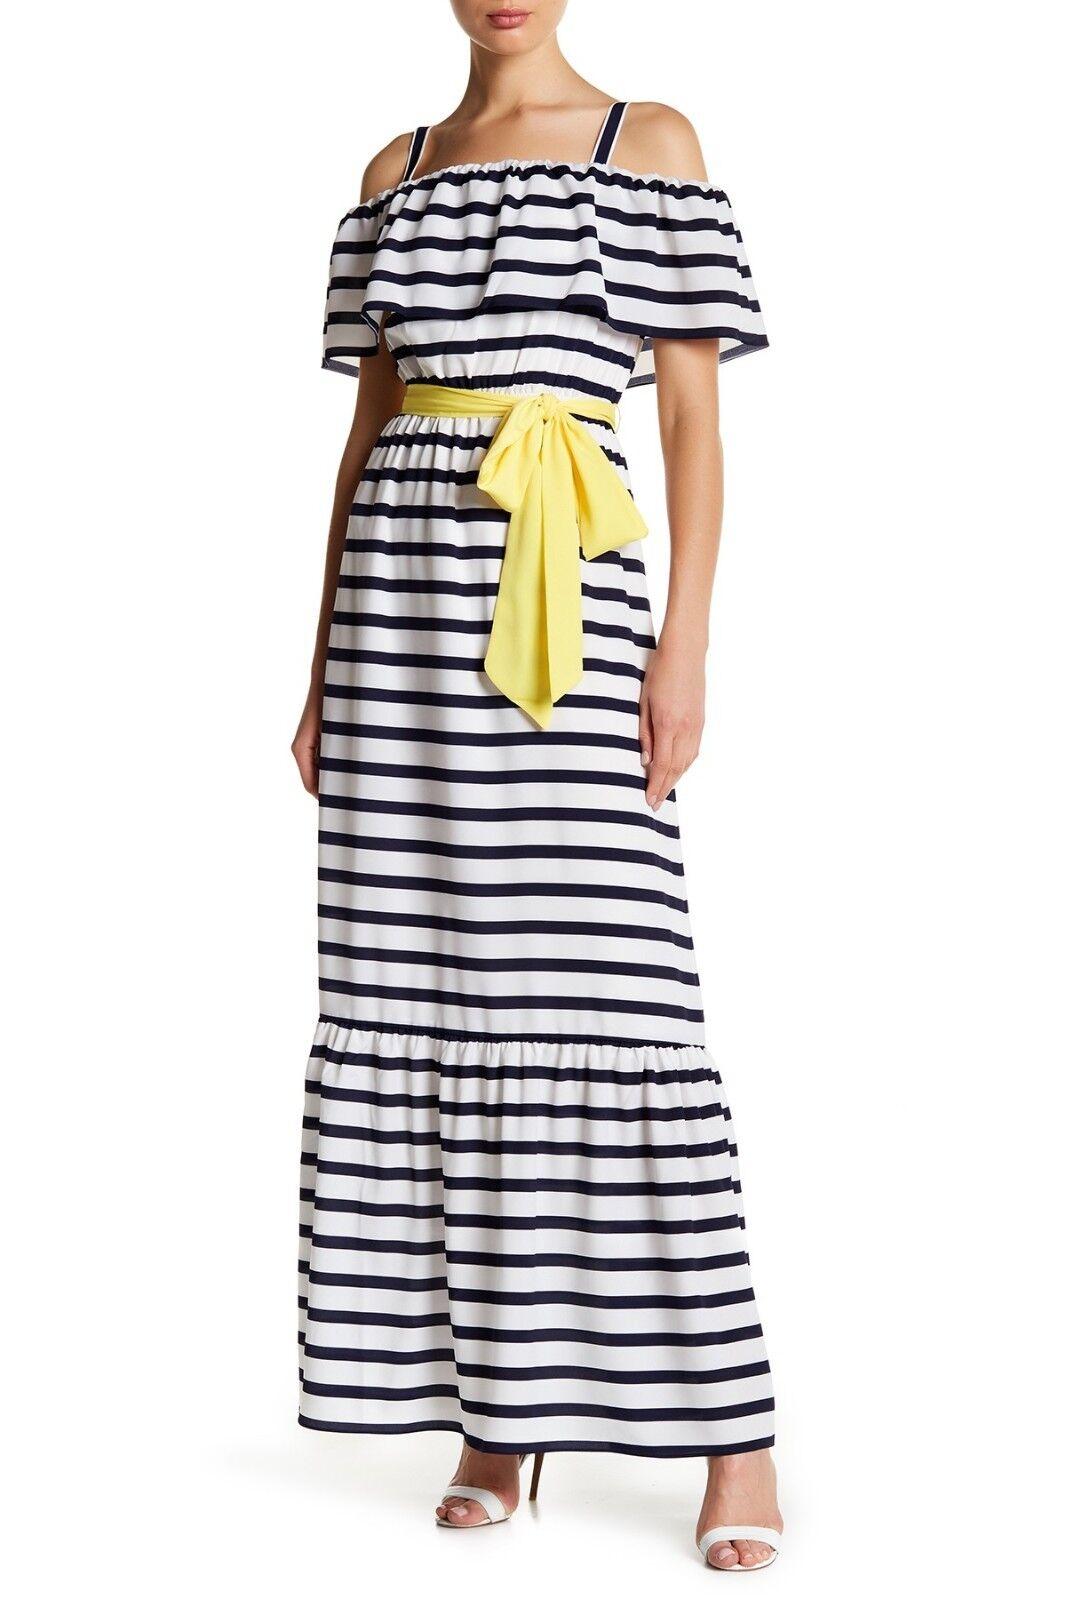 Eliza J Women's Ruffle Cold Shoulder Striped Maxi Dress Navy Ivory Size 8